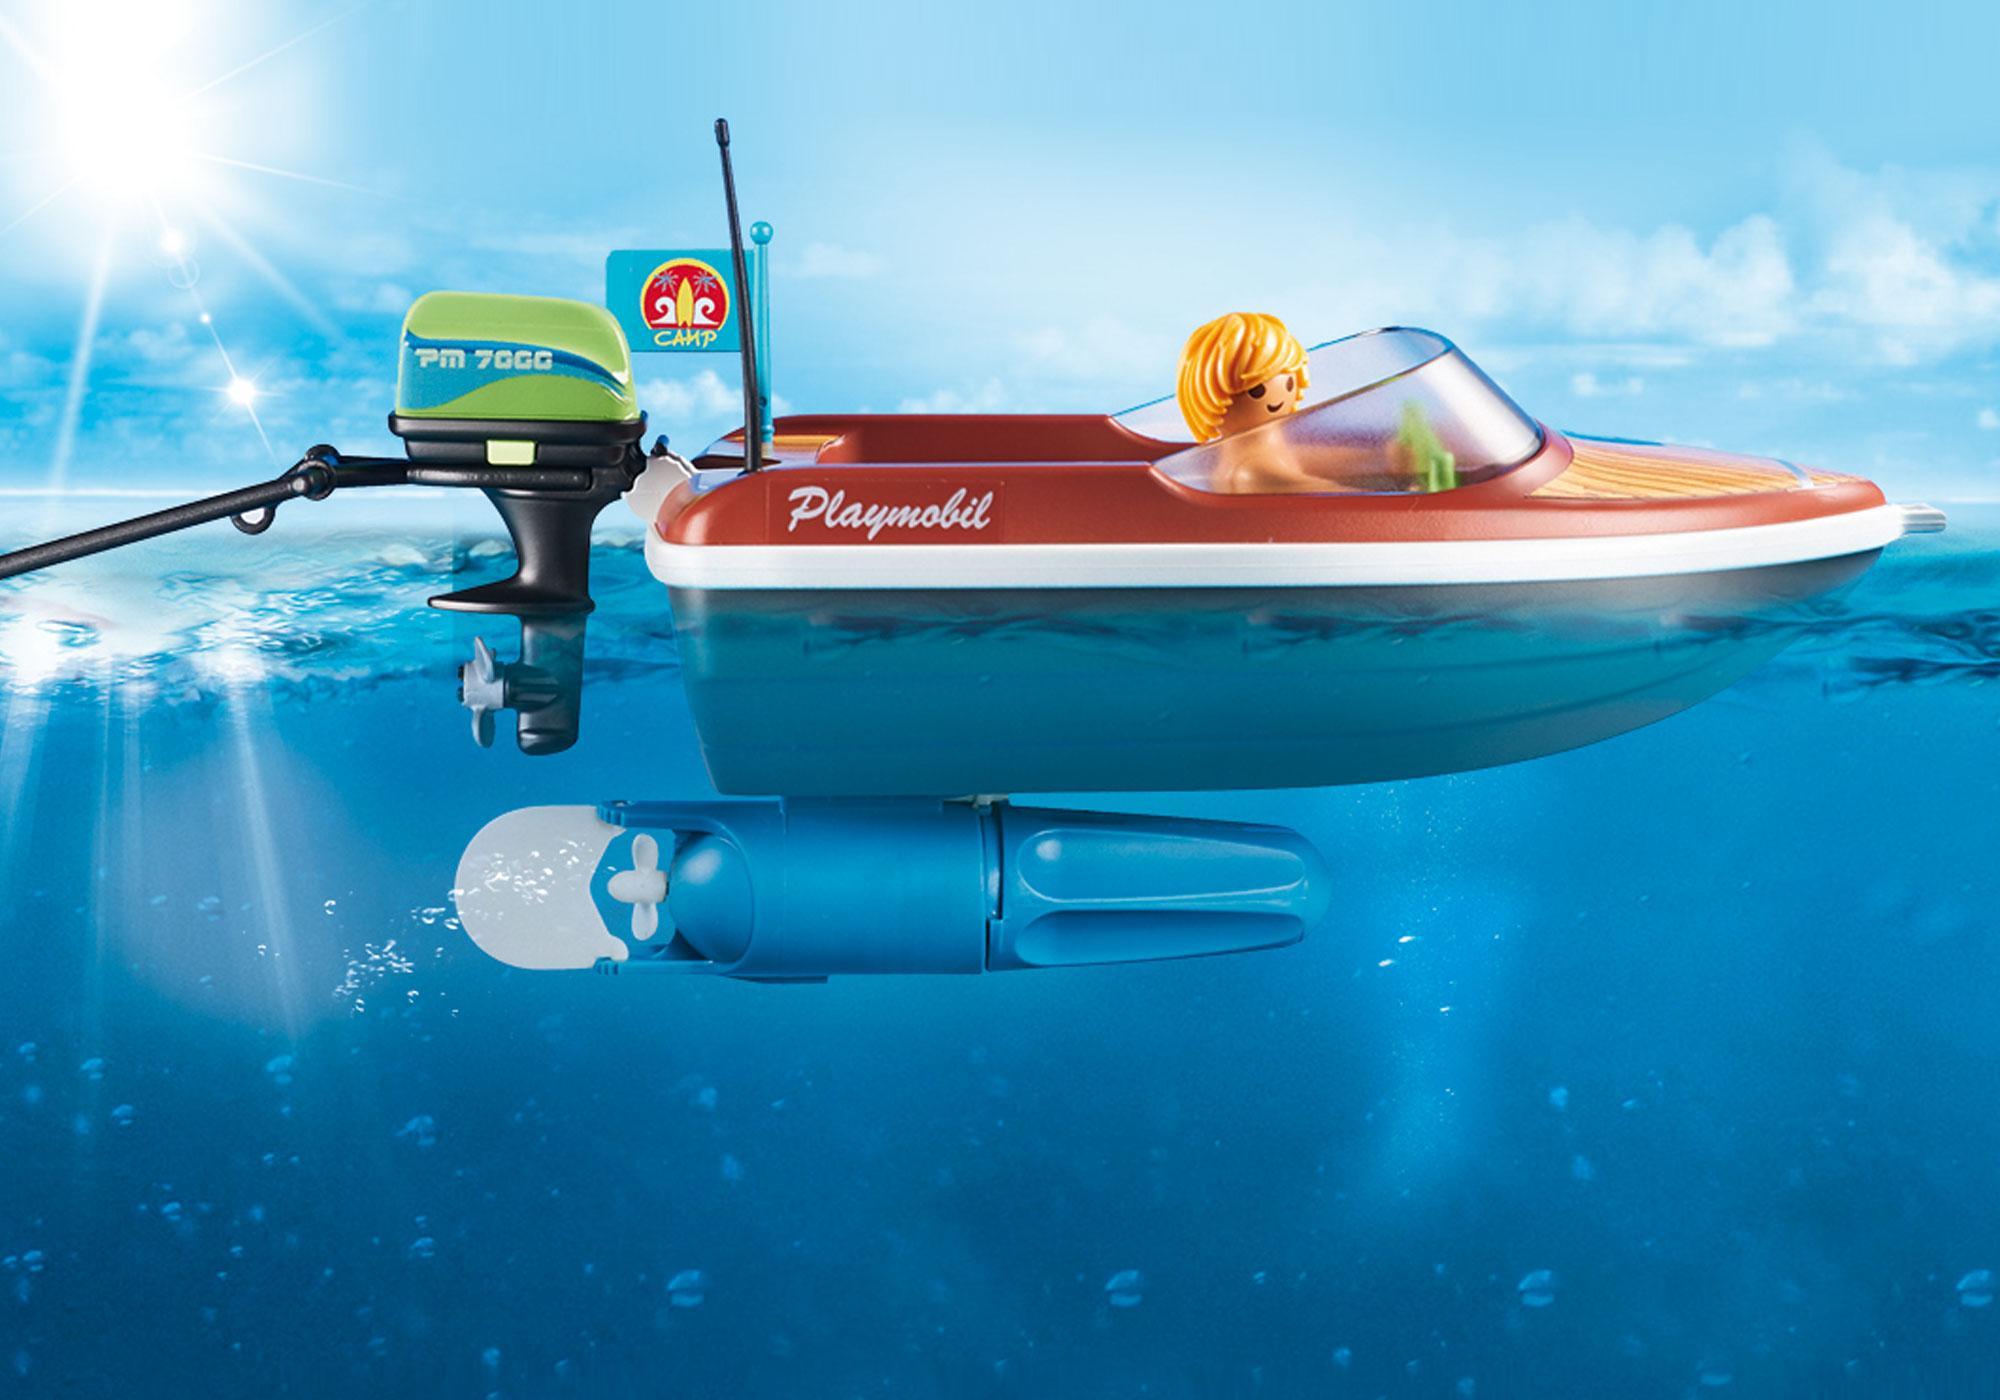 http://media.playmobil.com/i/playmobil/70091_product_extra1/Motorboot met funtubes